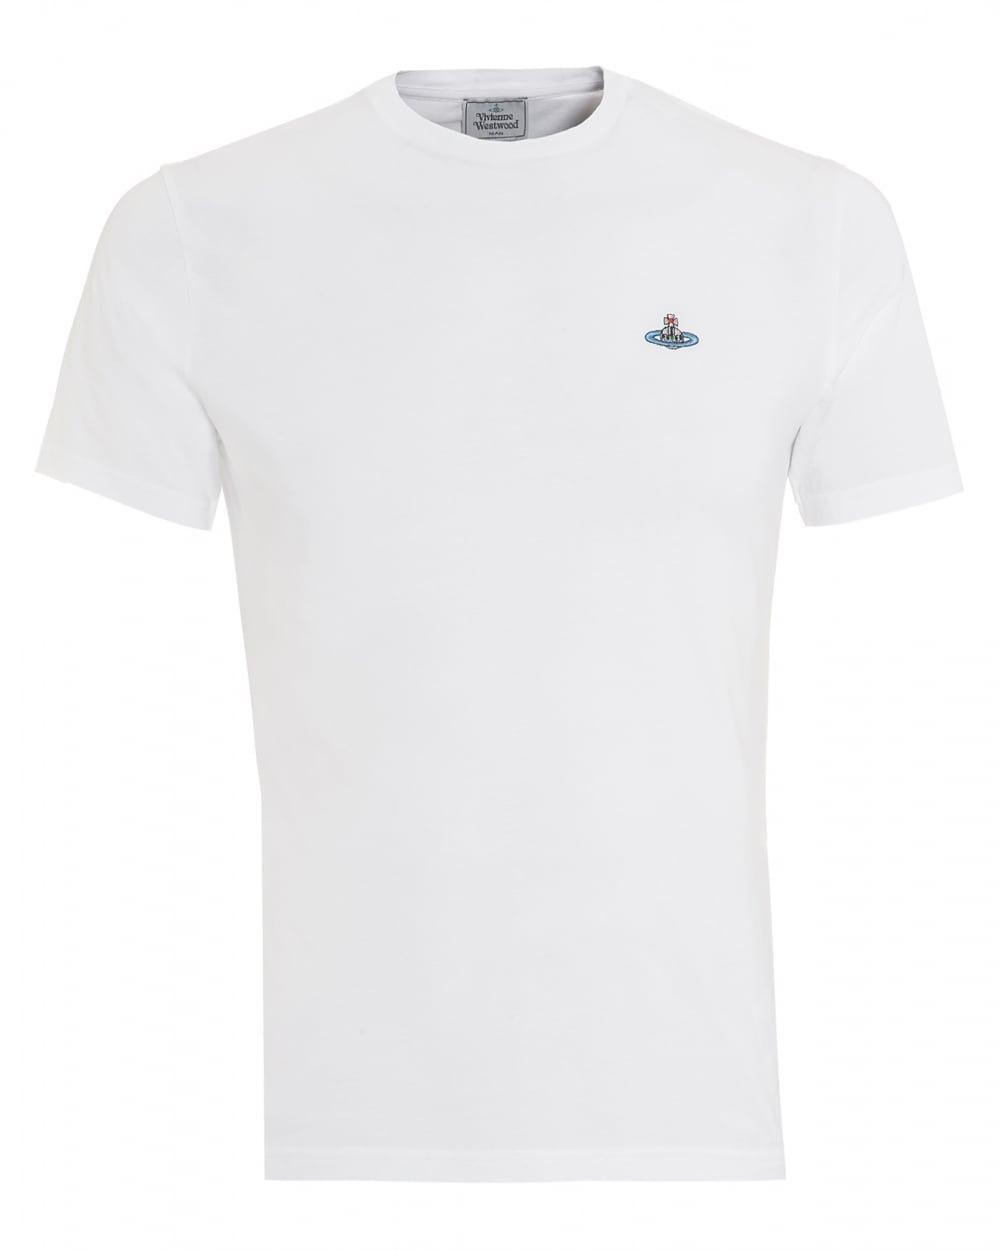 Mens T-Shirt, Orb Logo White Tee